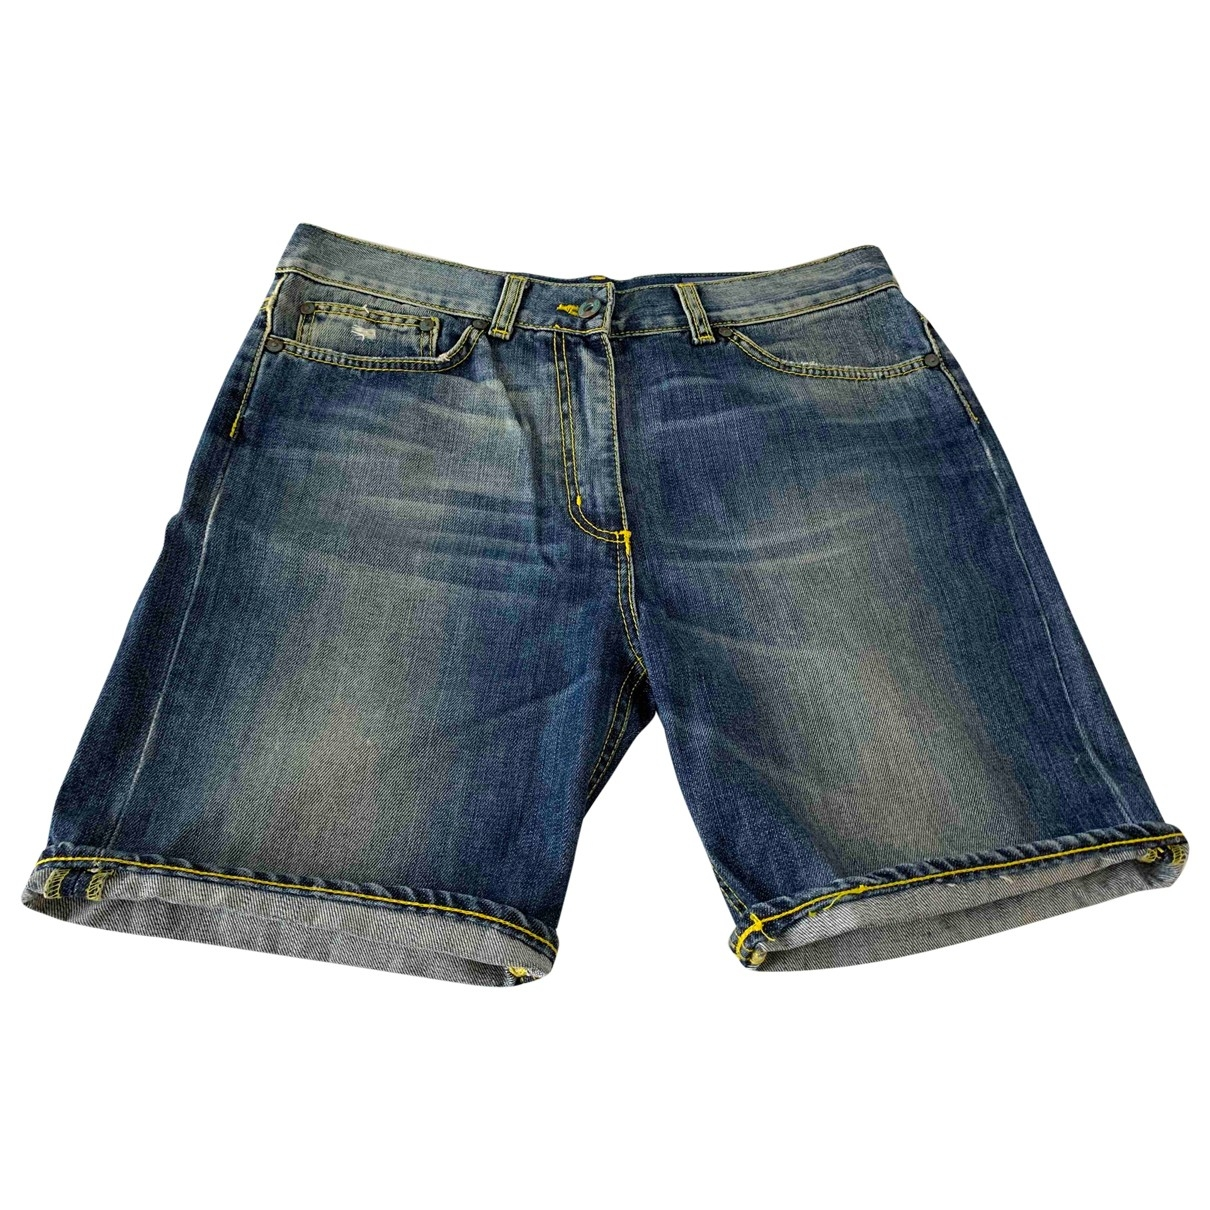 Dondup \N Shorts in Denim - Jeans